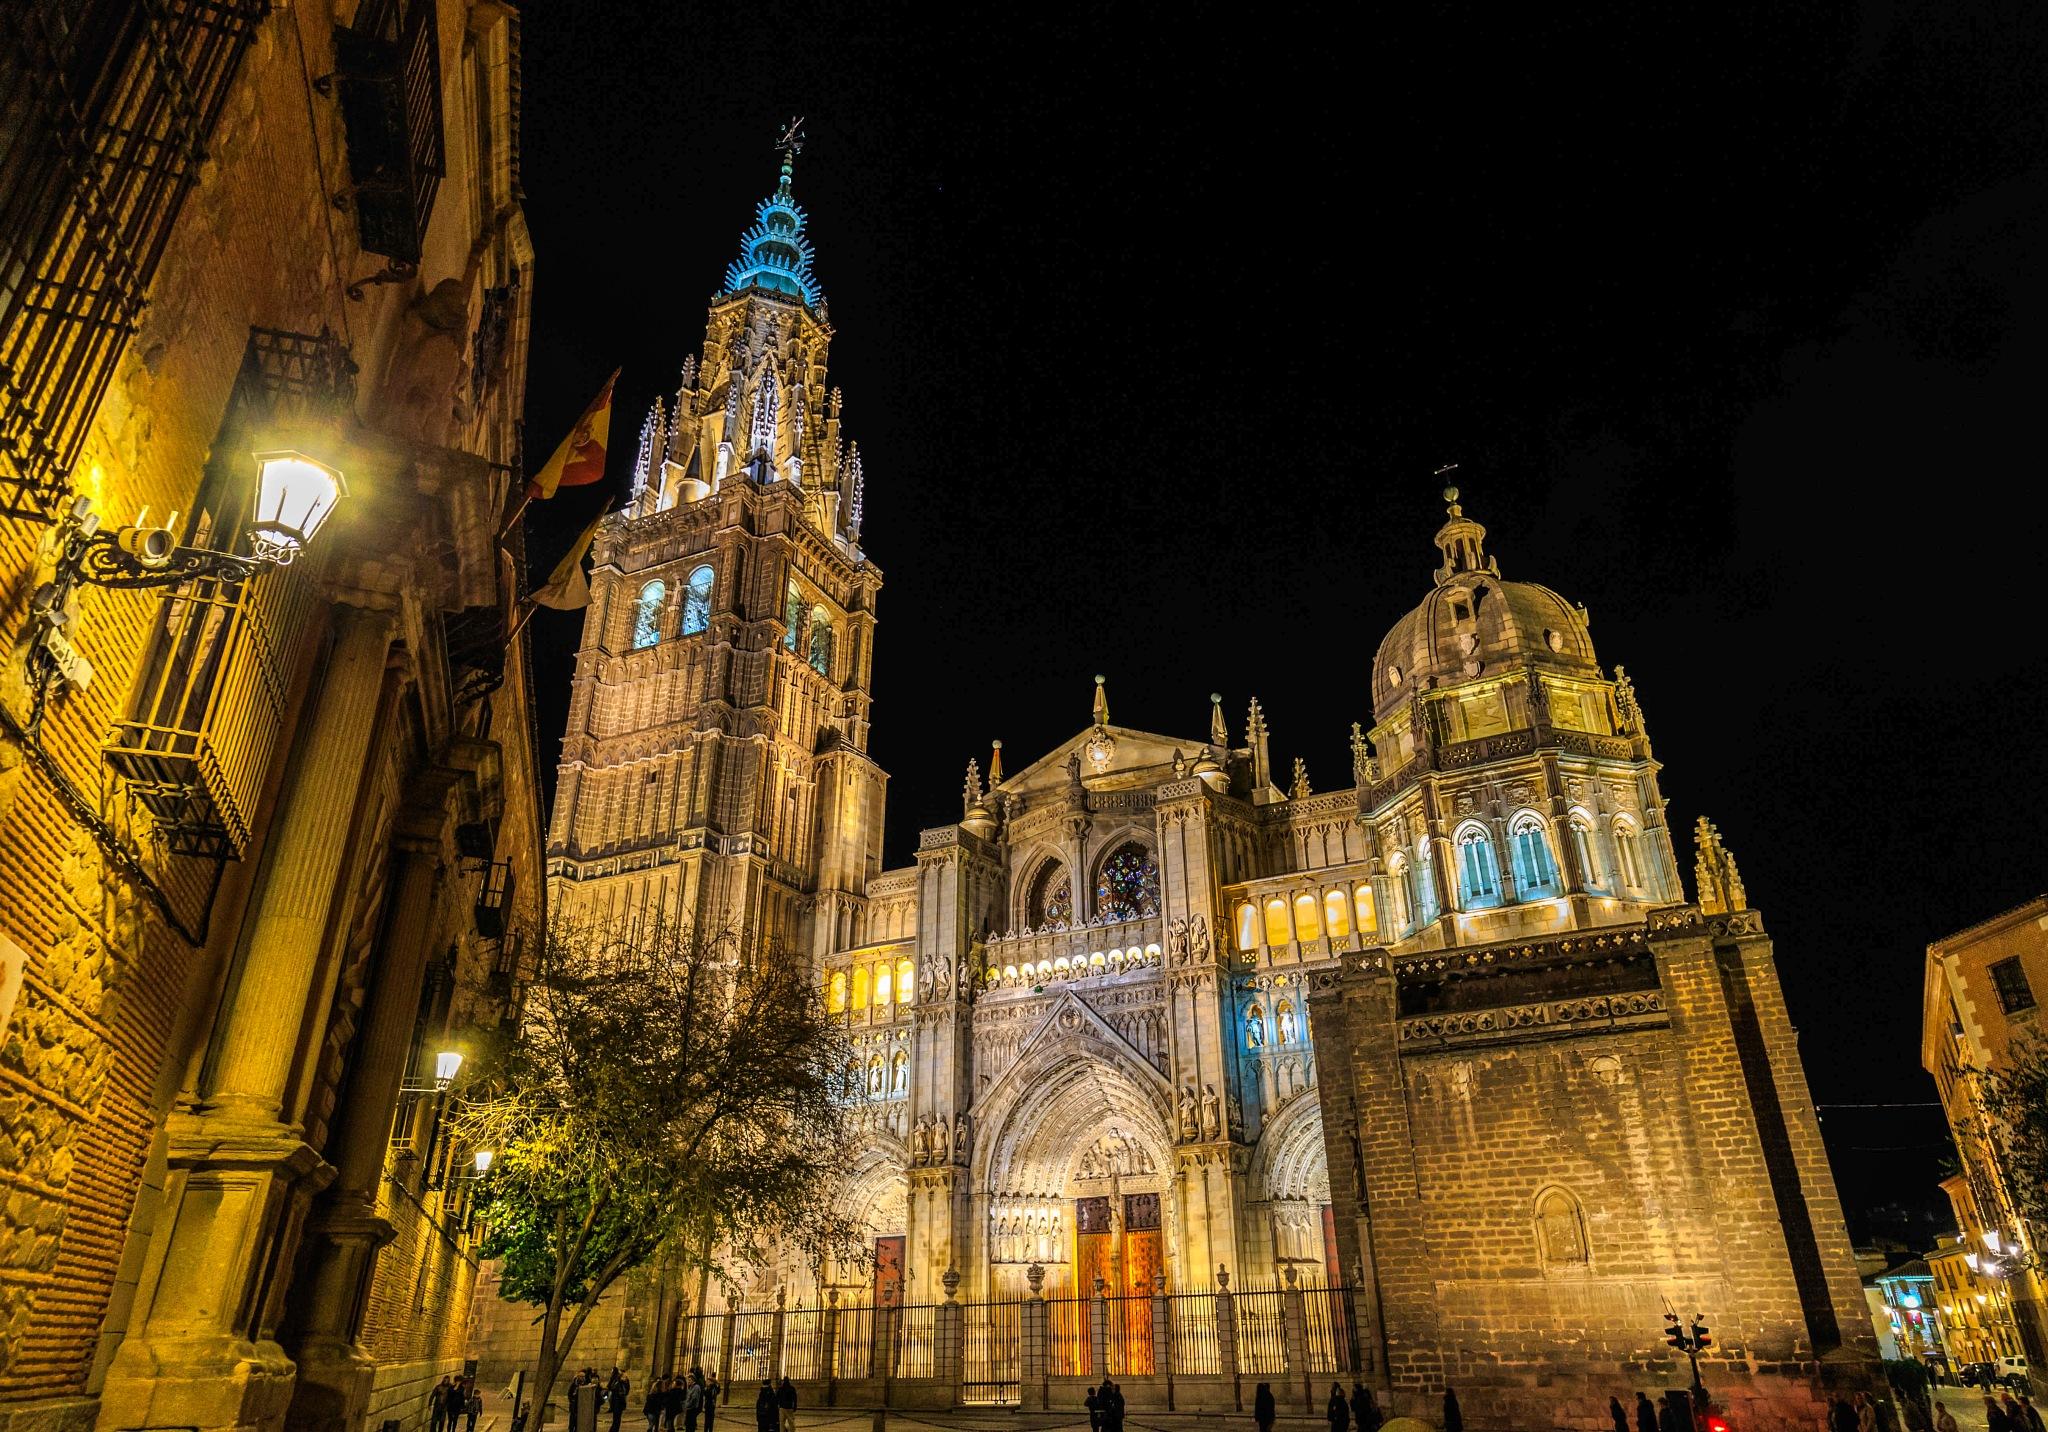 catedral de toledo by Roberto Gonzalo Romero